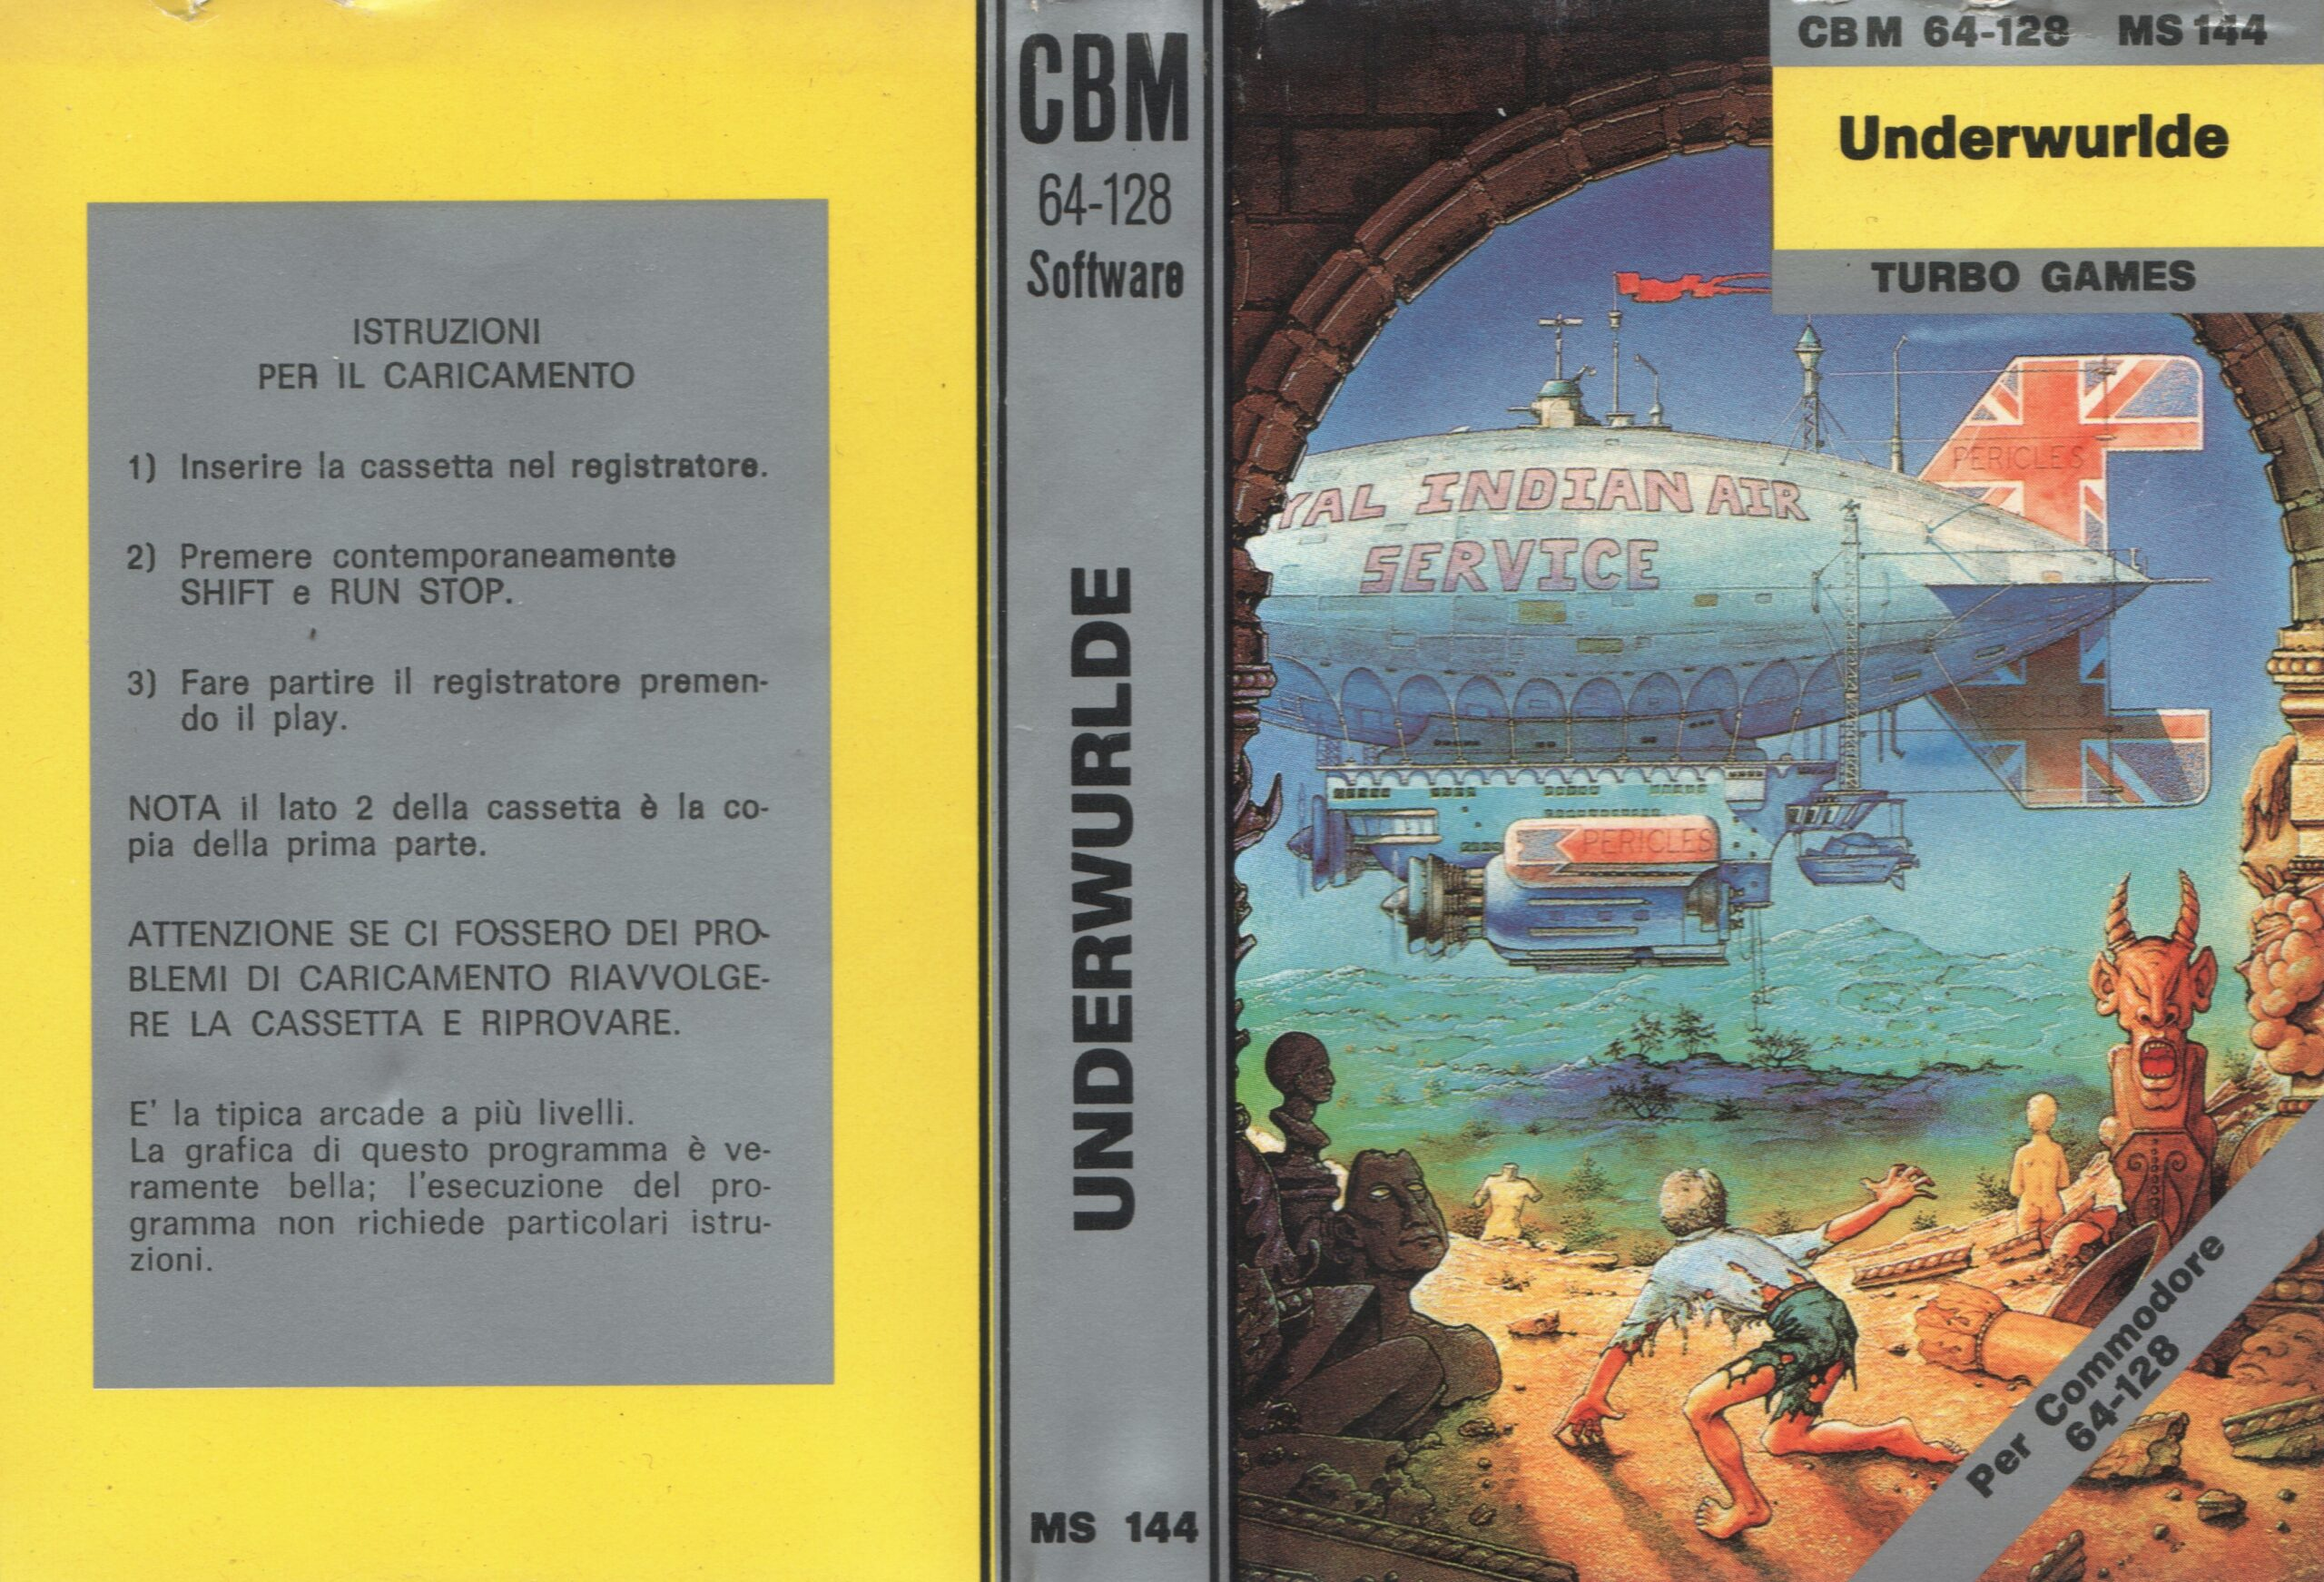 UNDERWURLDE MS 144